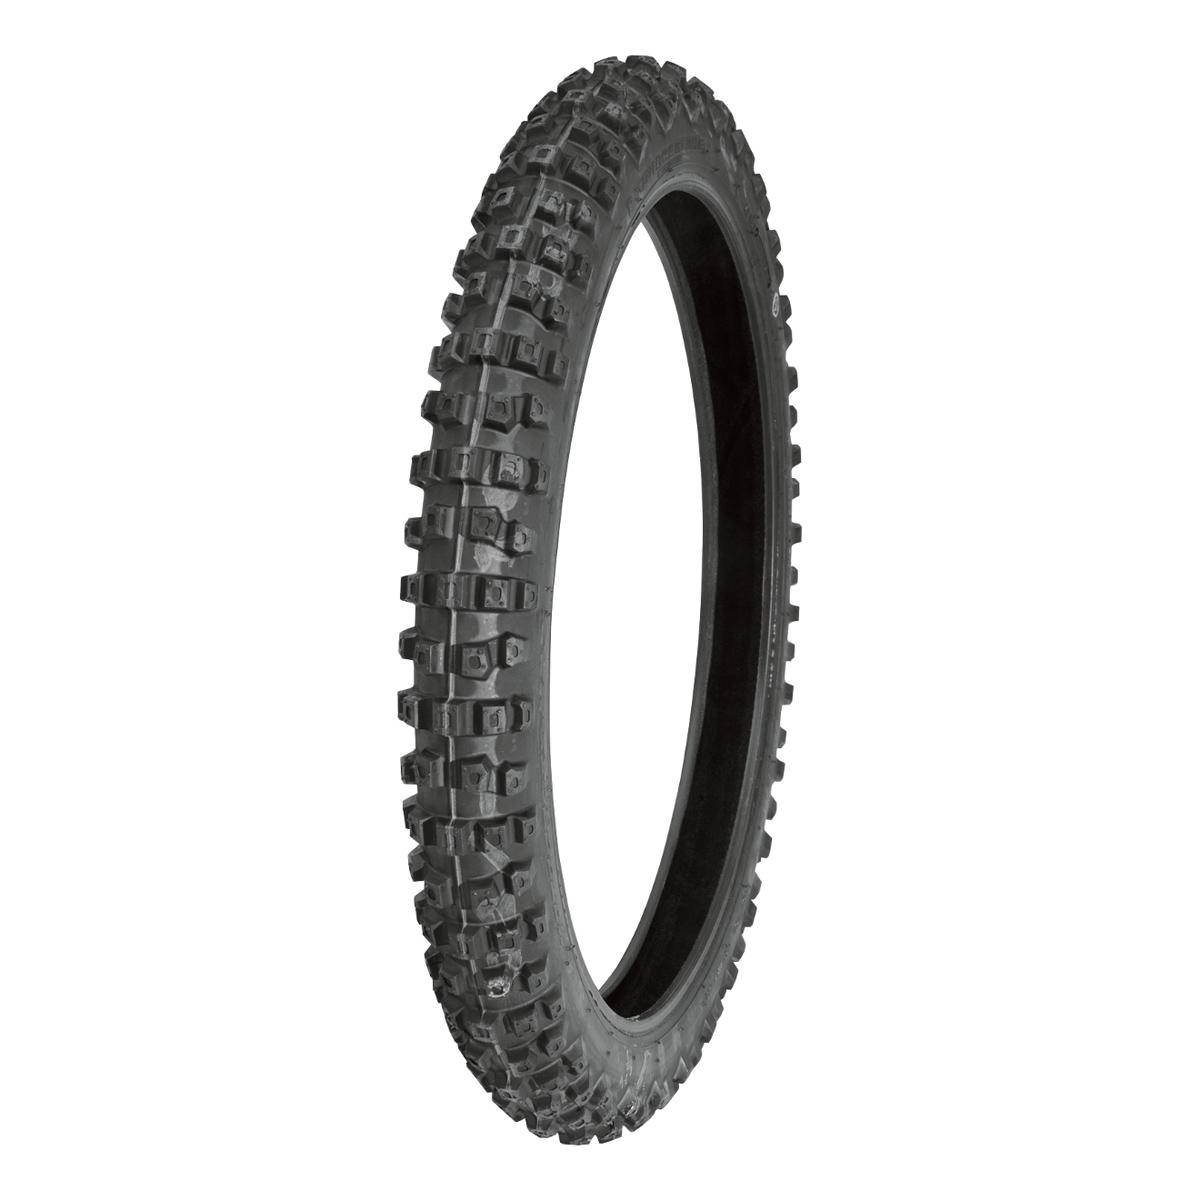 Bridgestone M23 2.50-19 H/T Front Tire